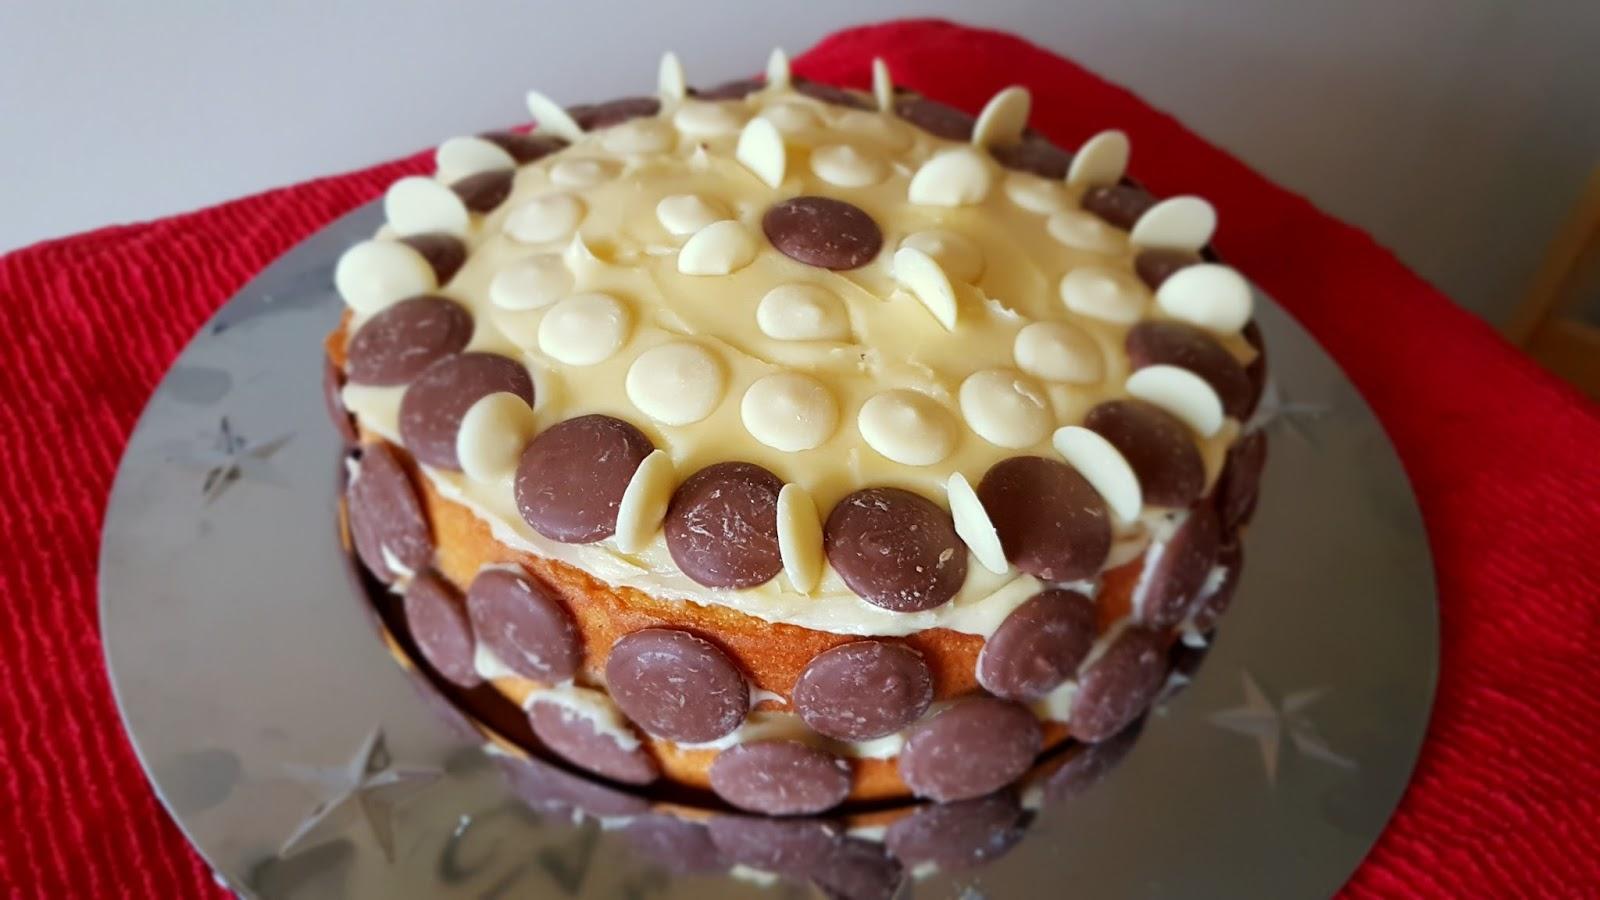 RAW Baking Chocolate button birthday cake